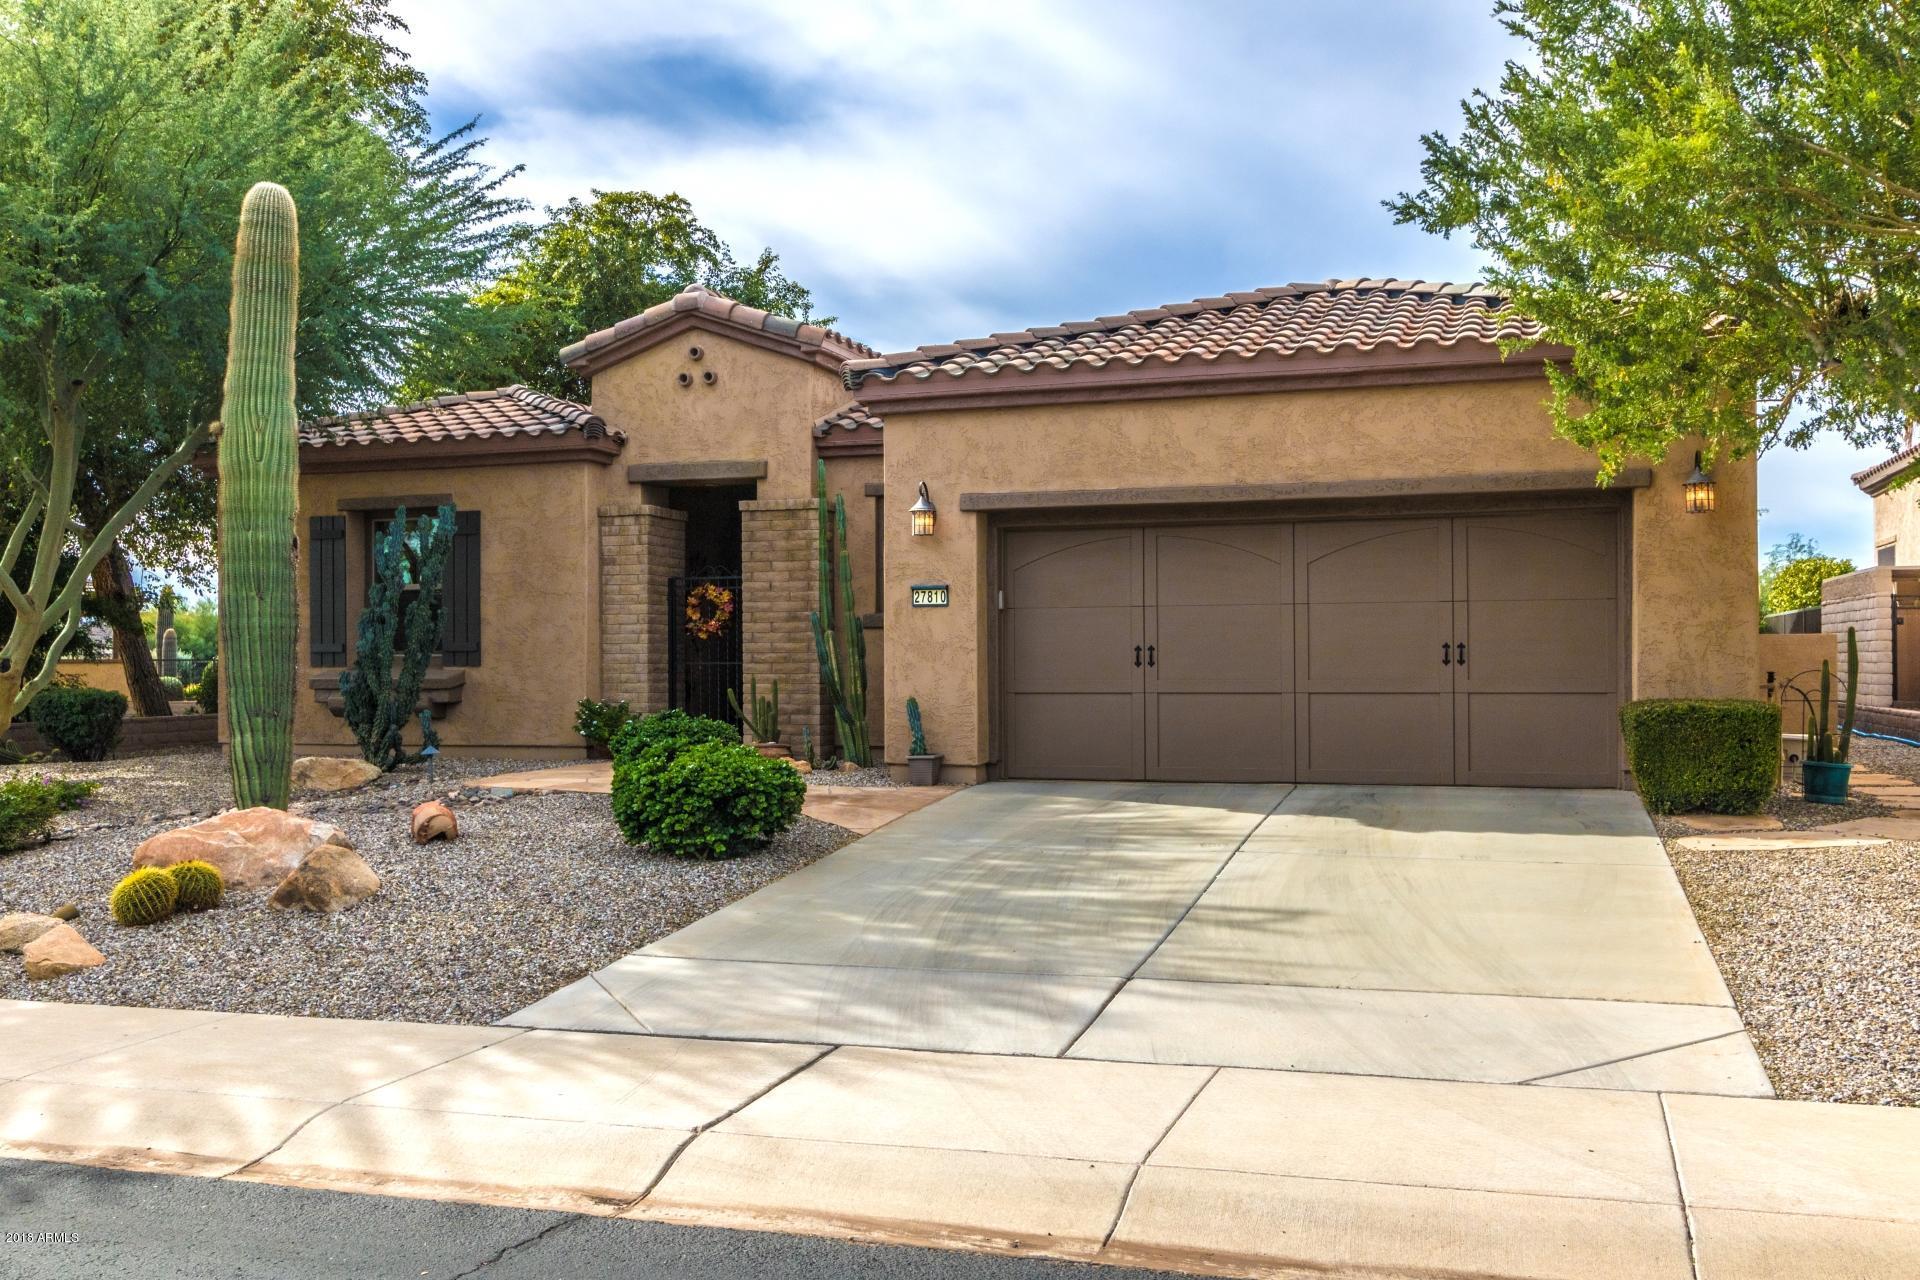 27810 N 130TH Avenue Peoria, AZ 85383 - MLS #: 5854558